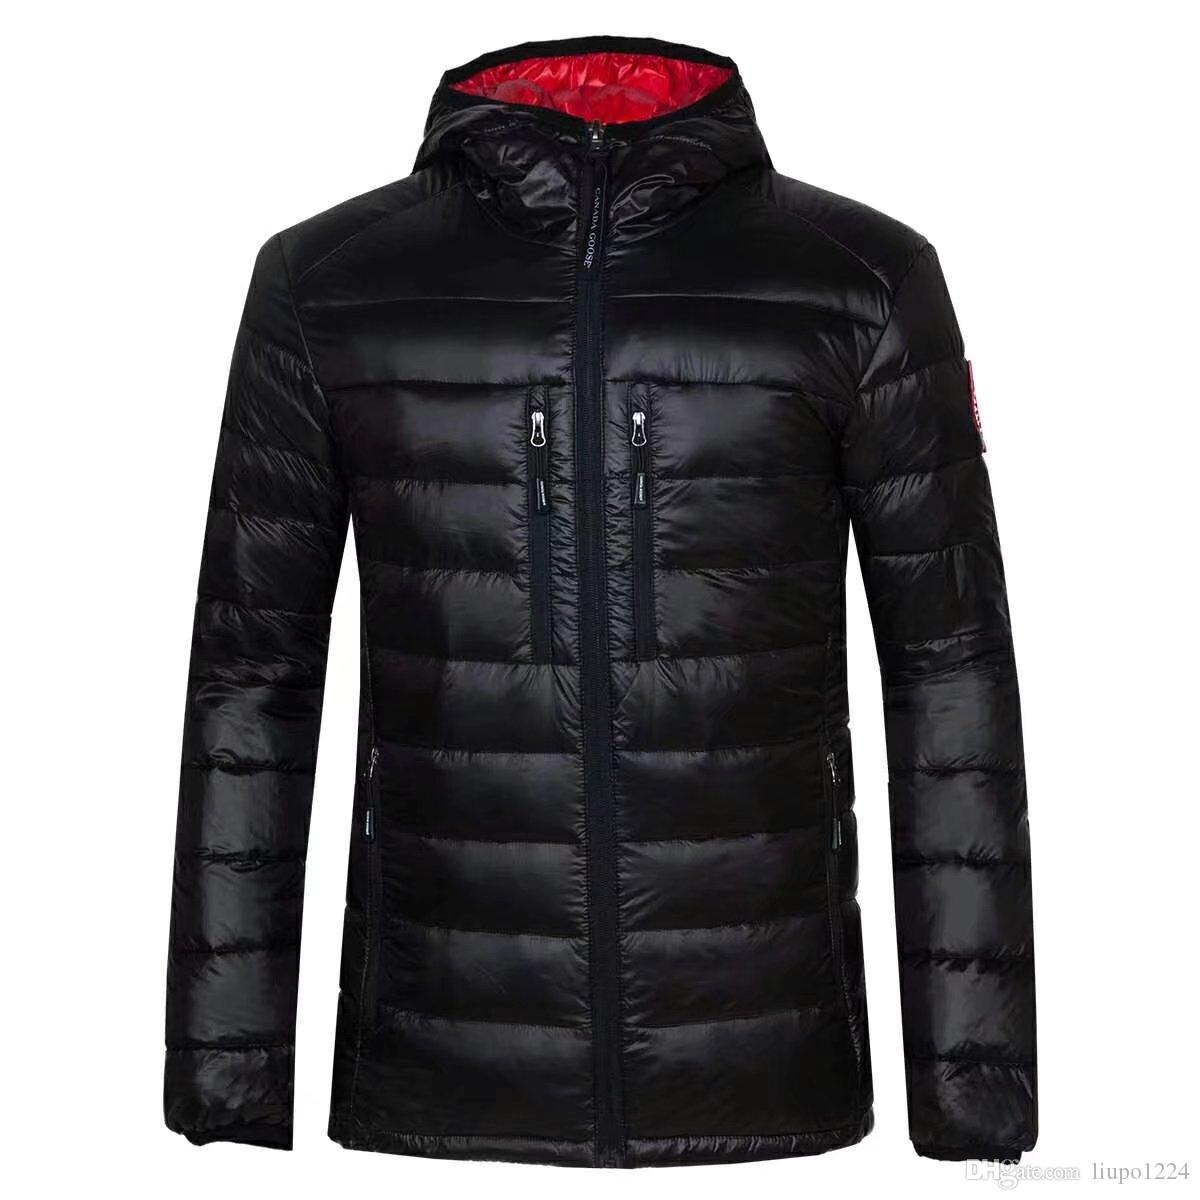 canada goose jacket dhgate